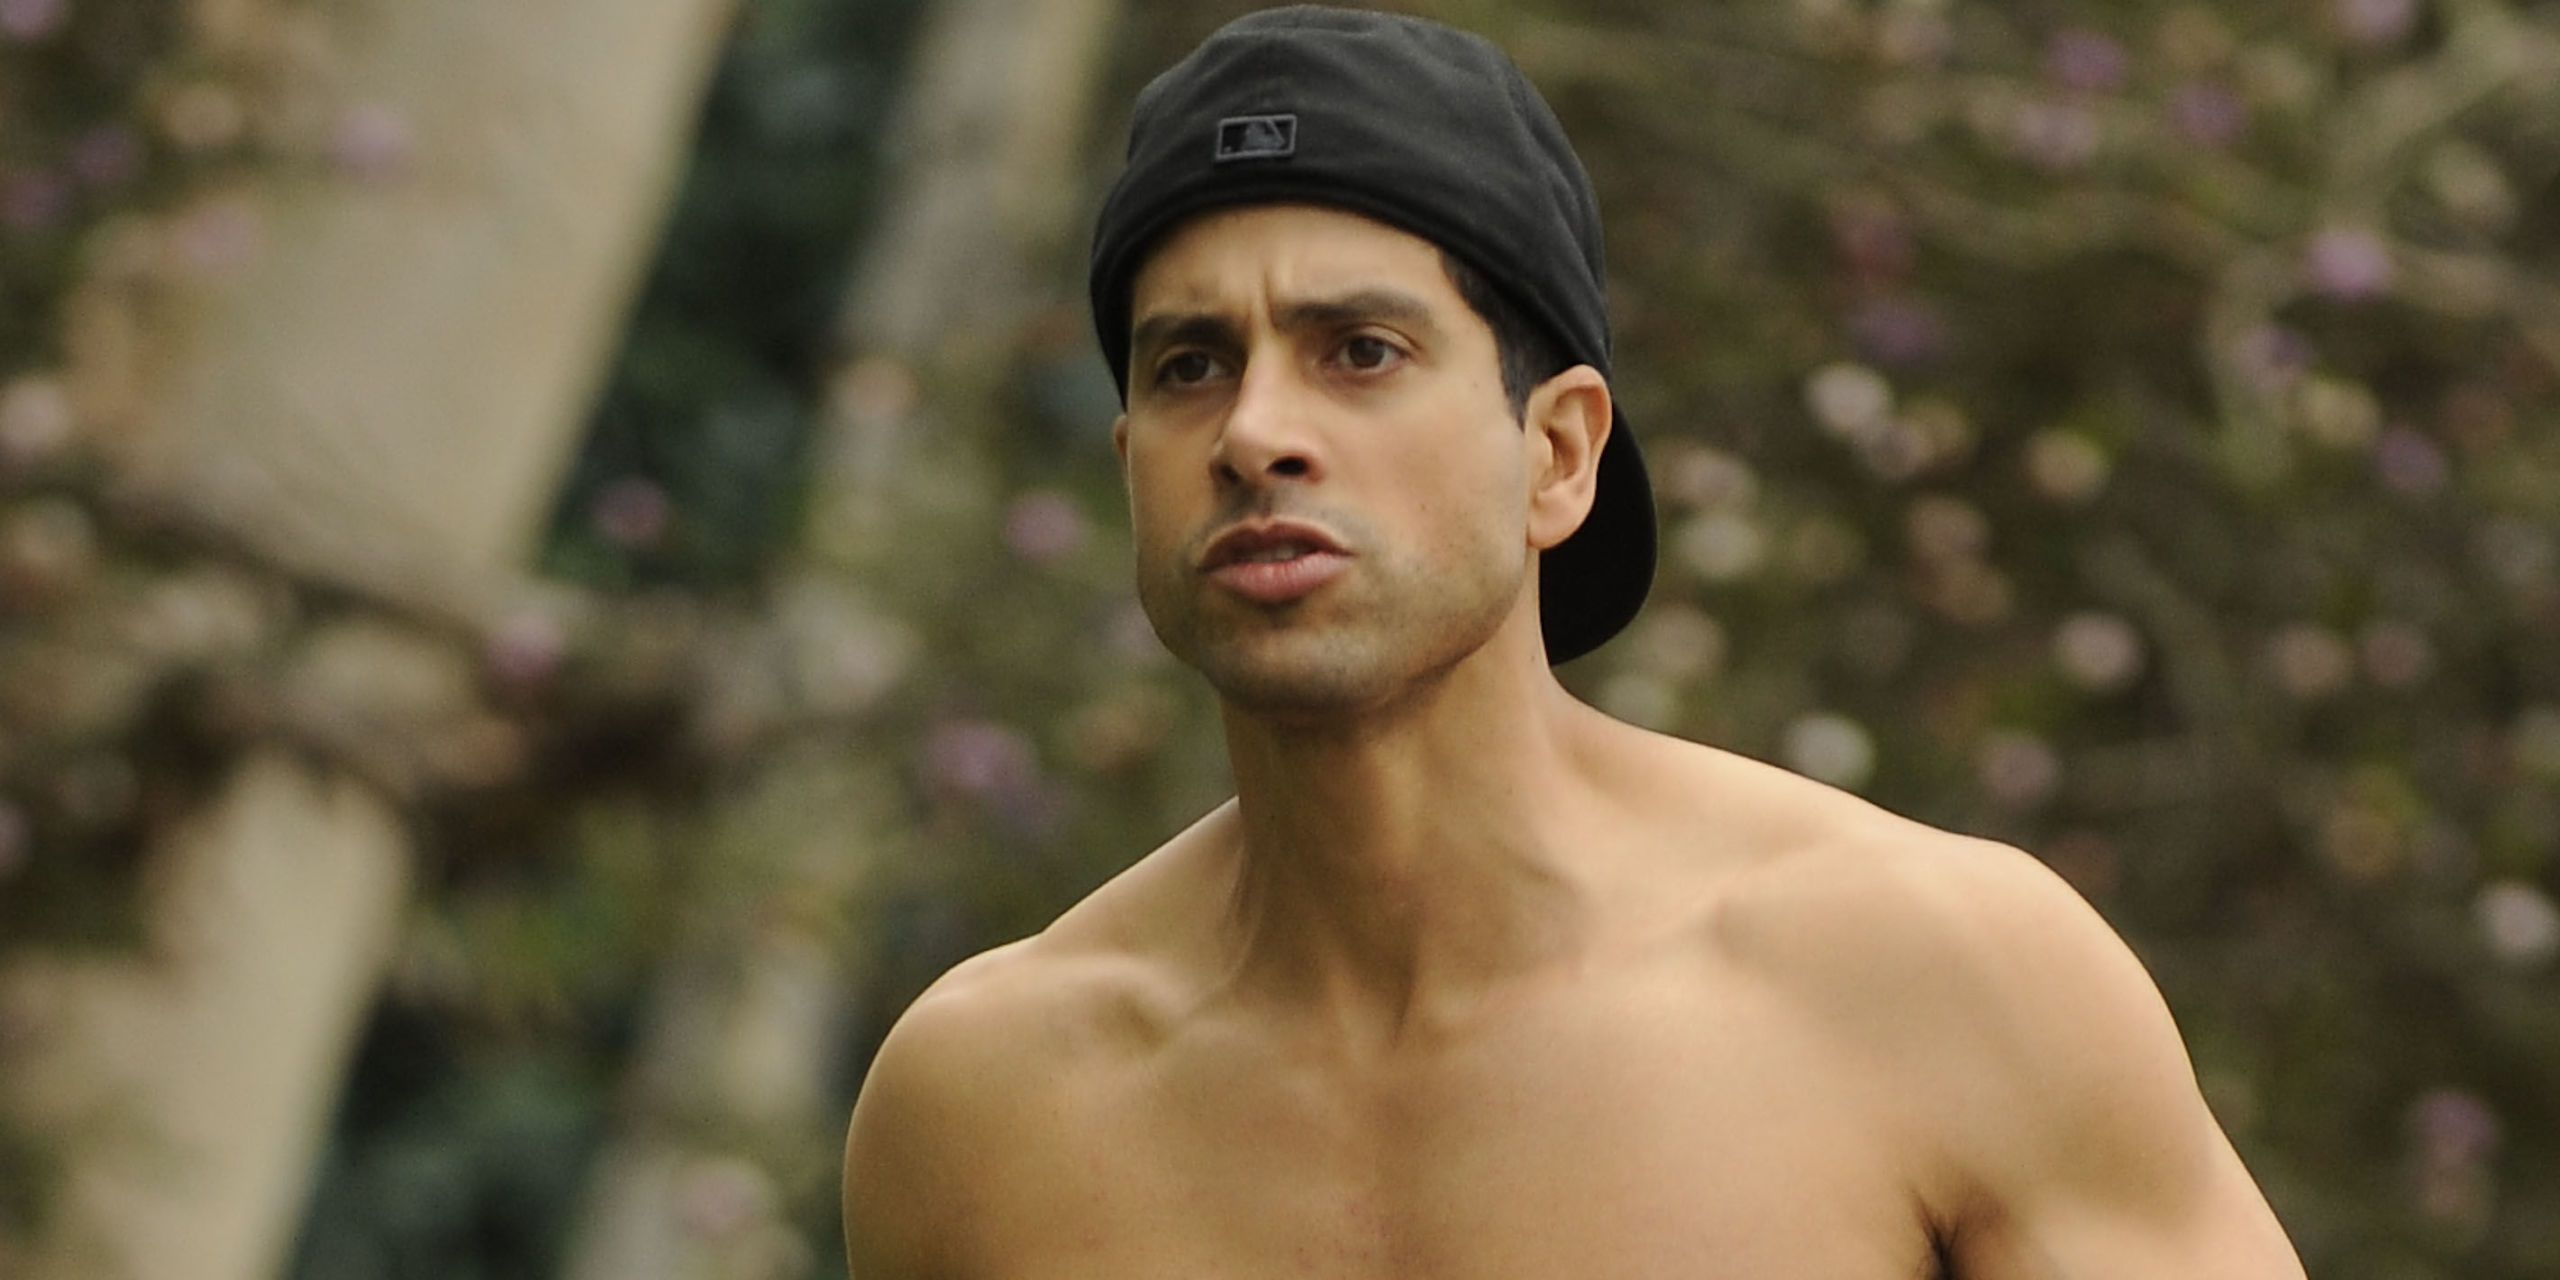 Golden G. reccomend Hot hispanic male models